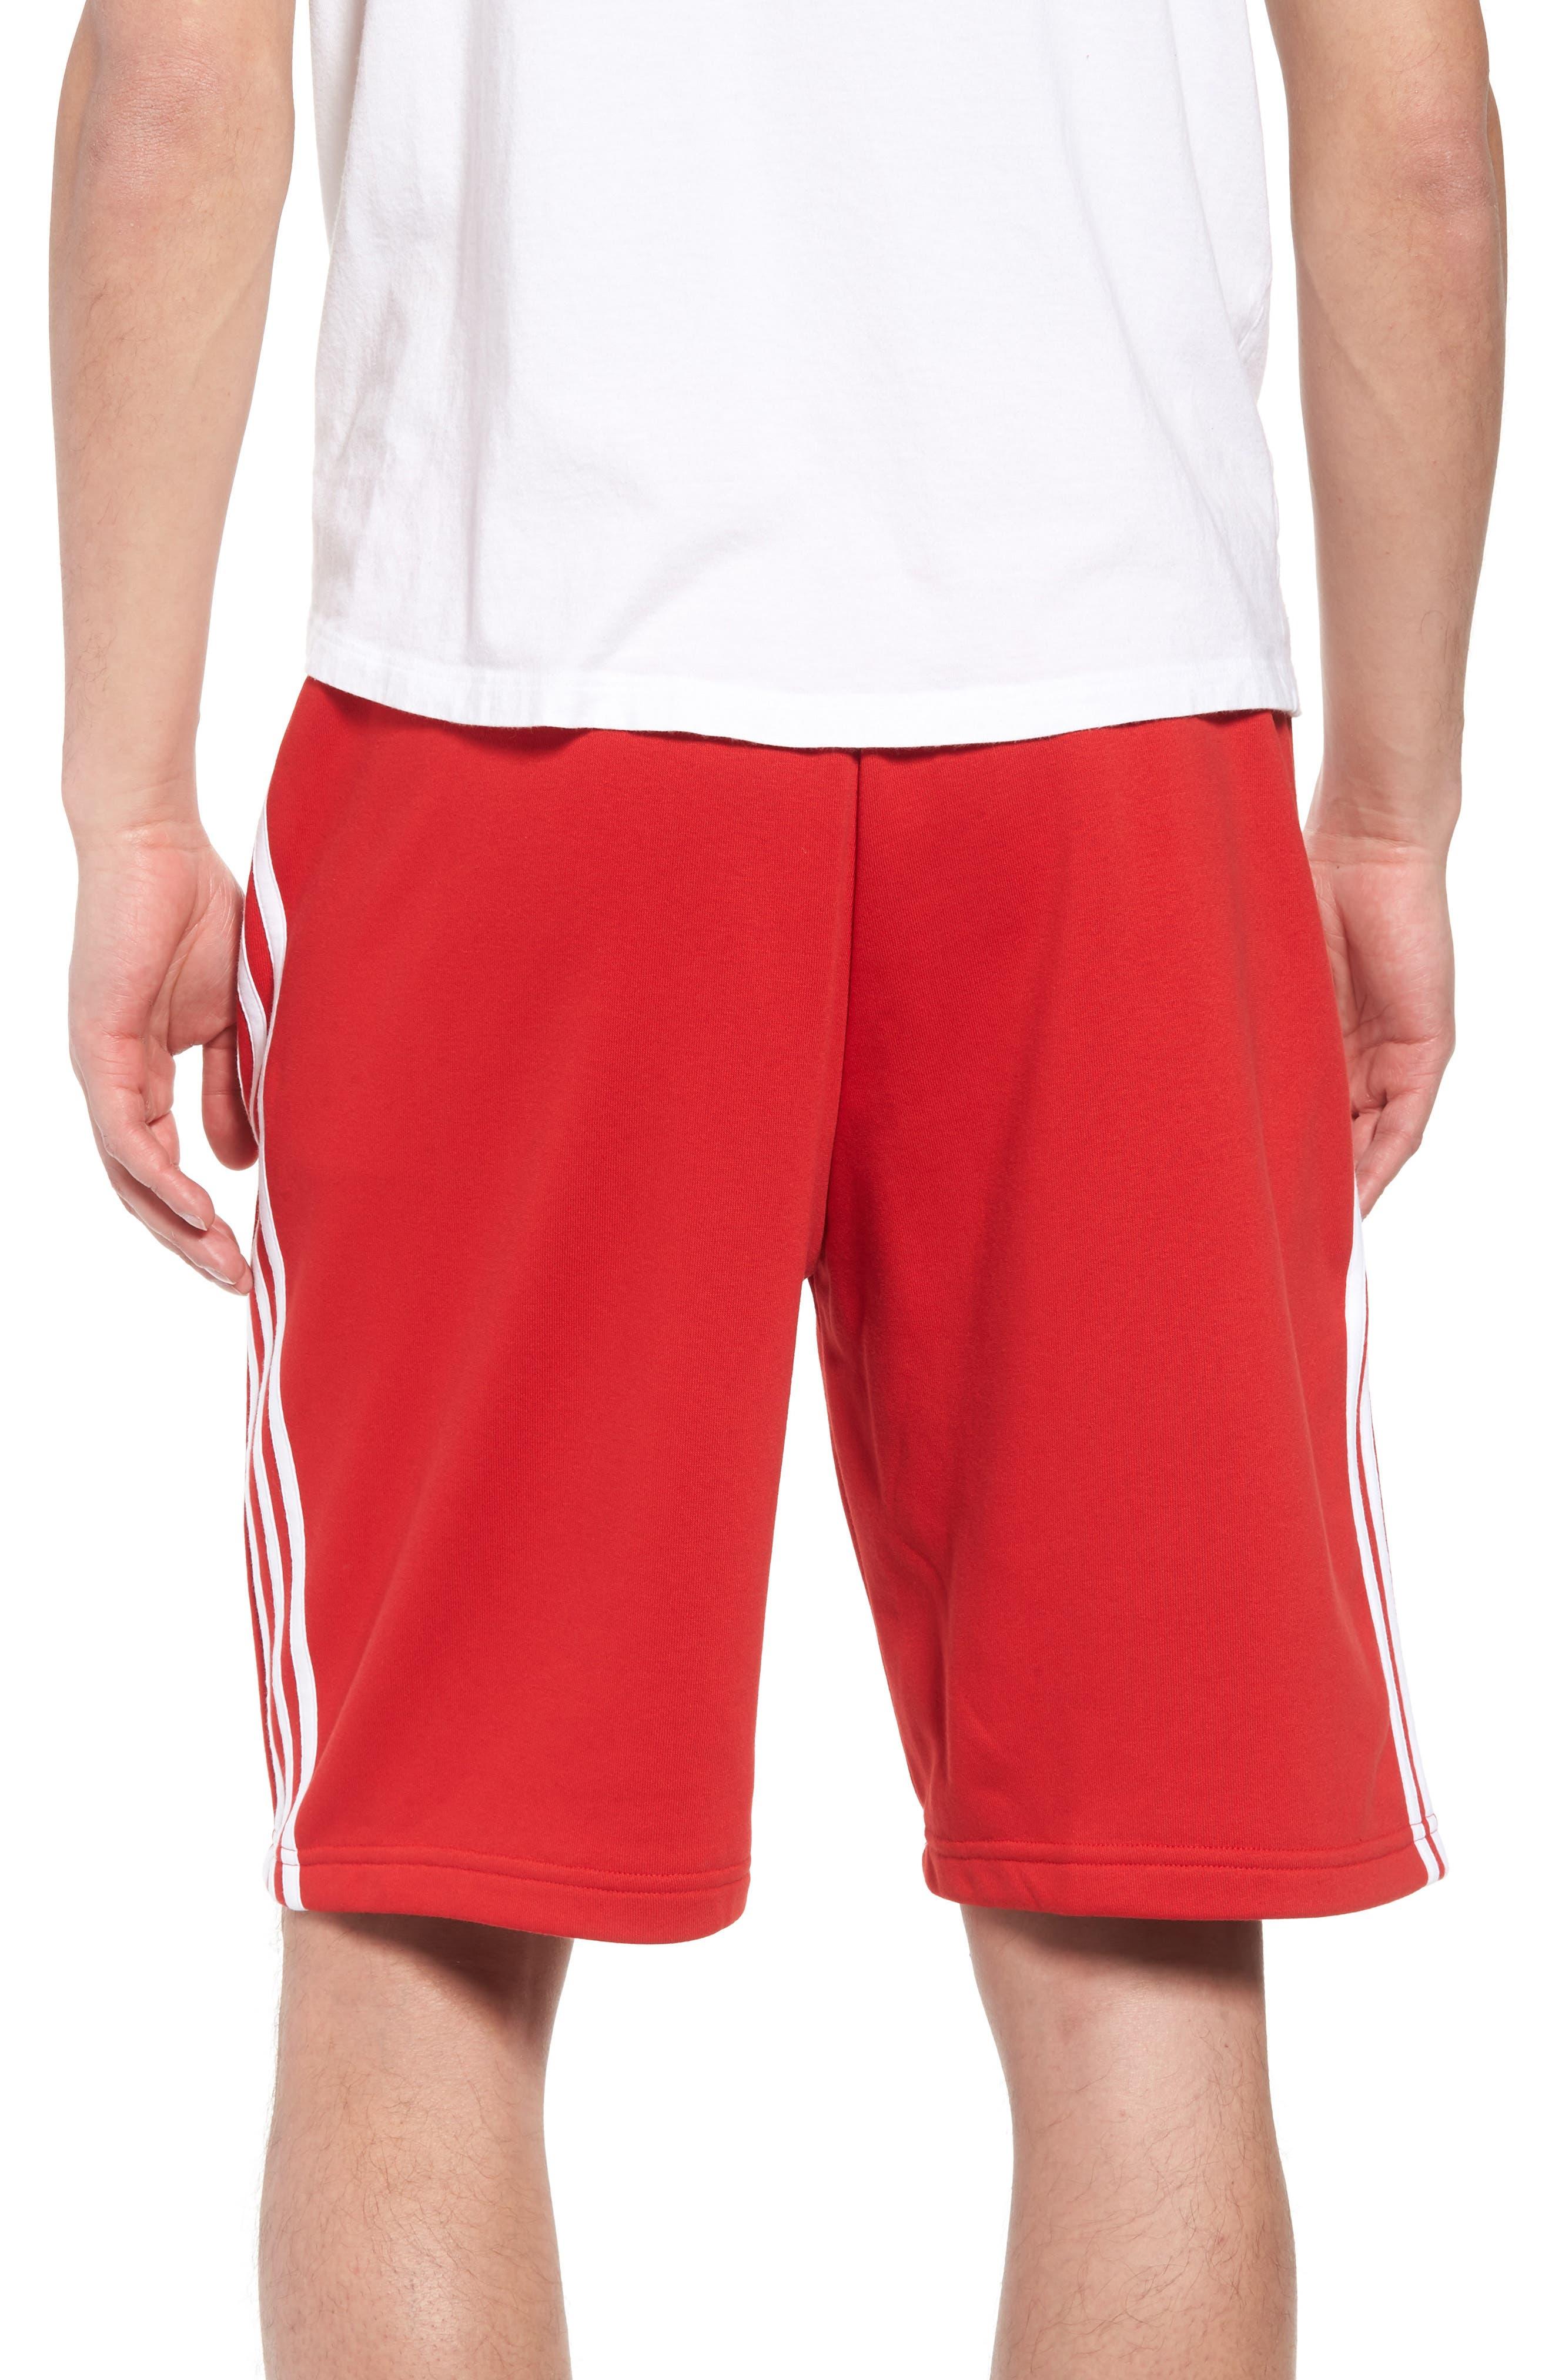 3-Stripes Shorts,                             Alternate thumbnail 2, color,                             Red/ White